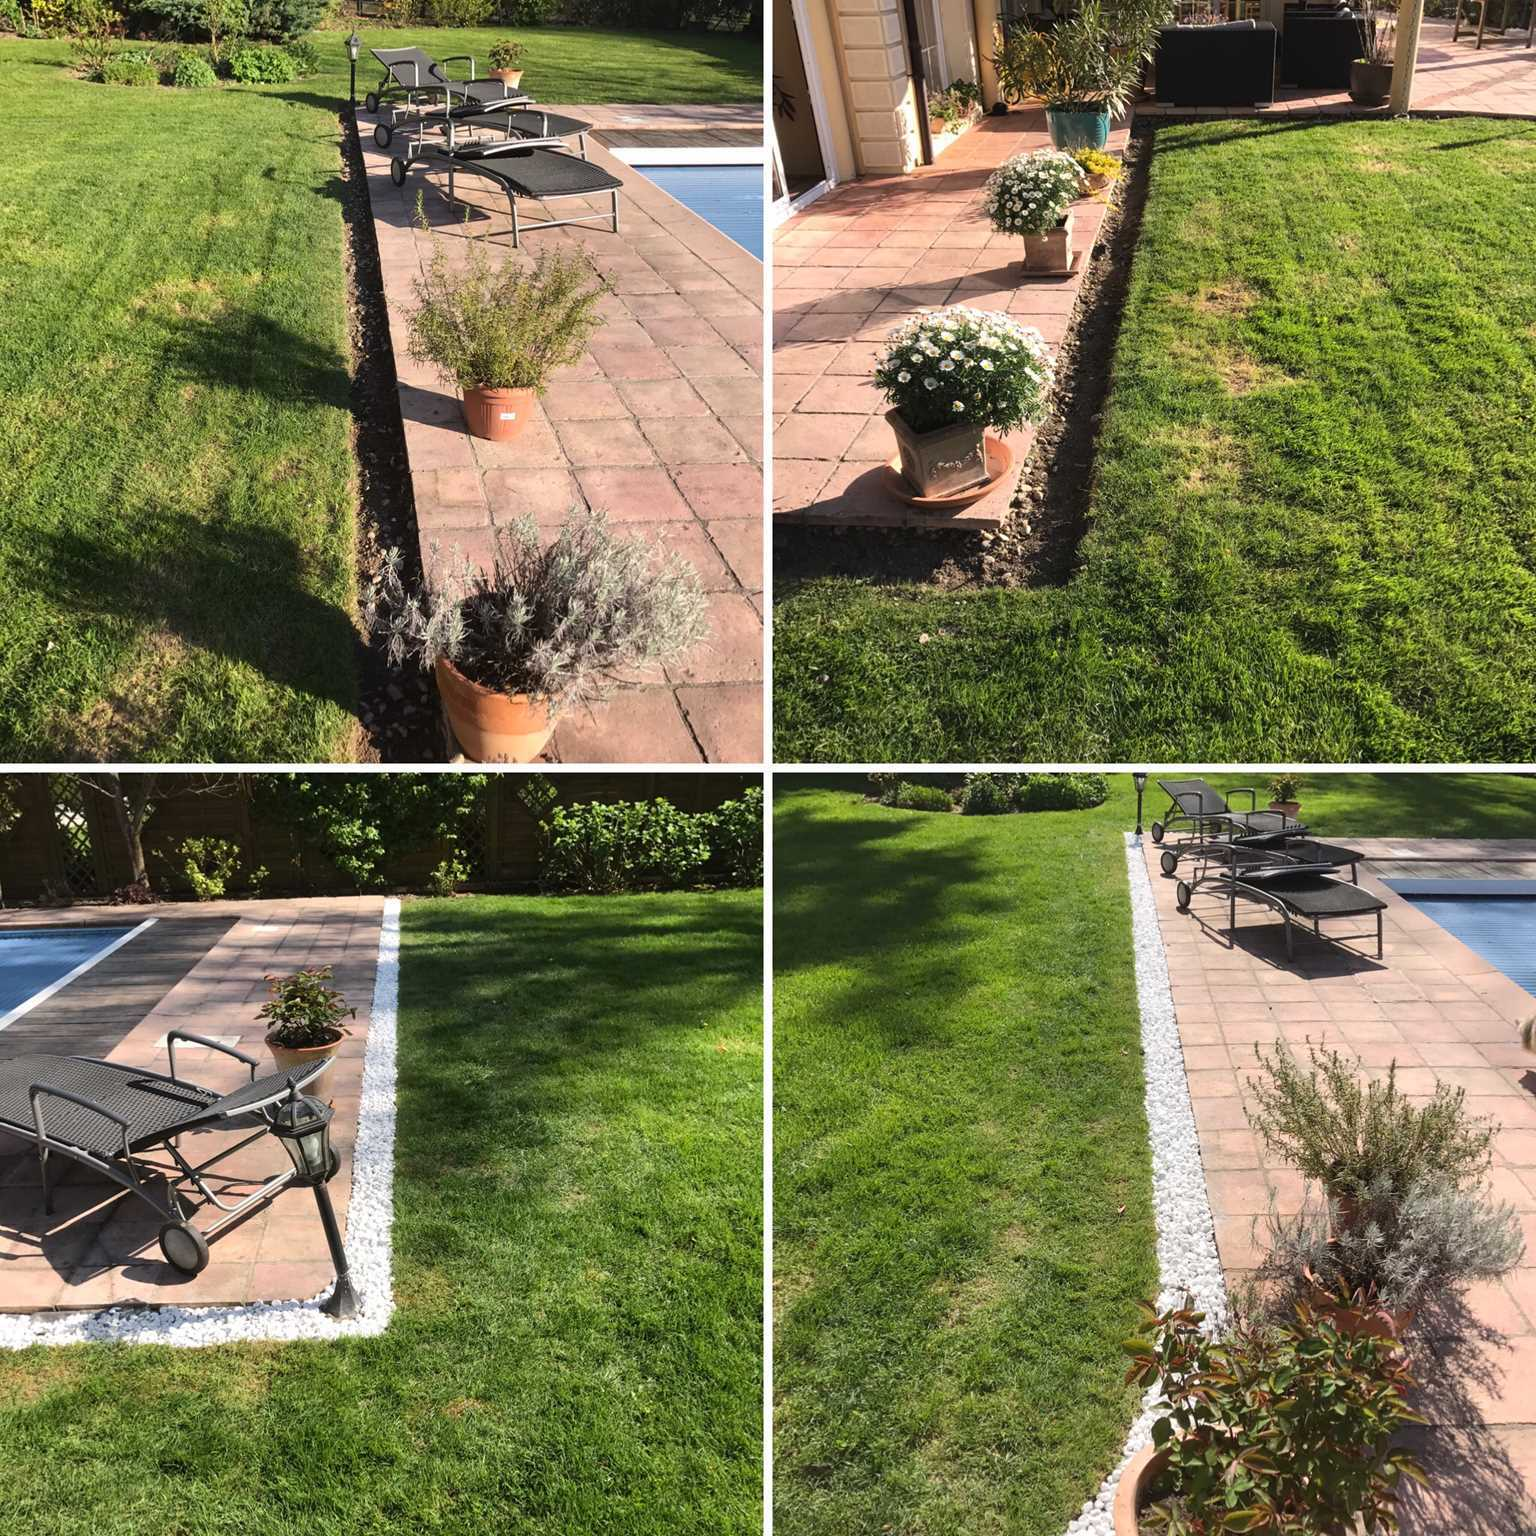 Parvex paysagiste entretien de jardins parcs potager for Entretien jardin 49